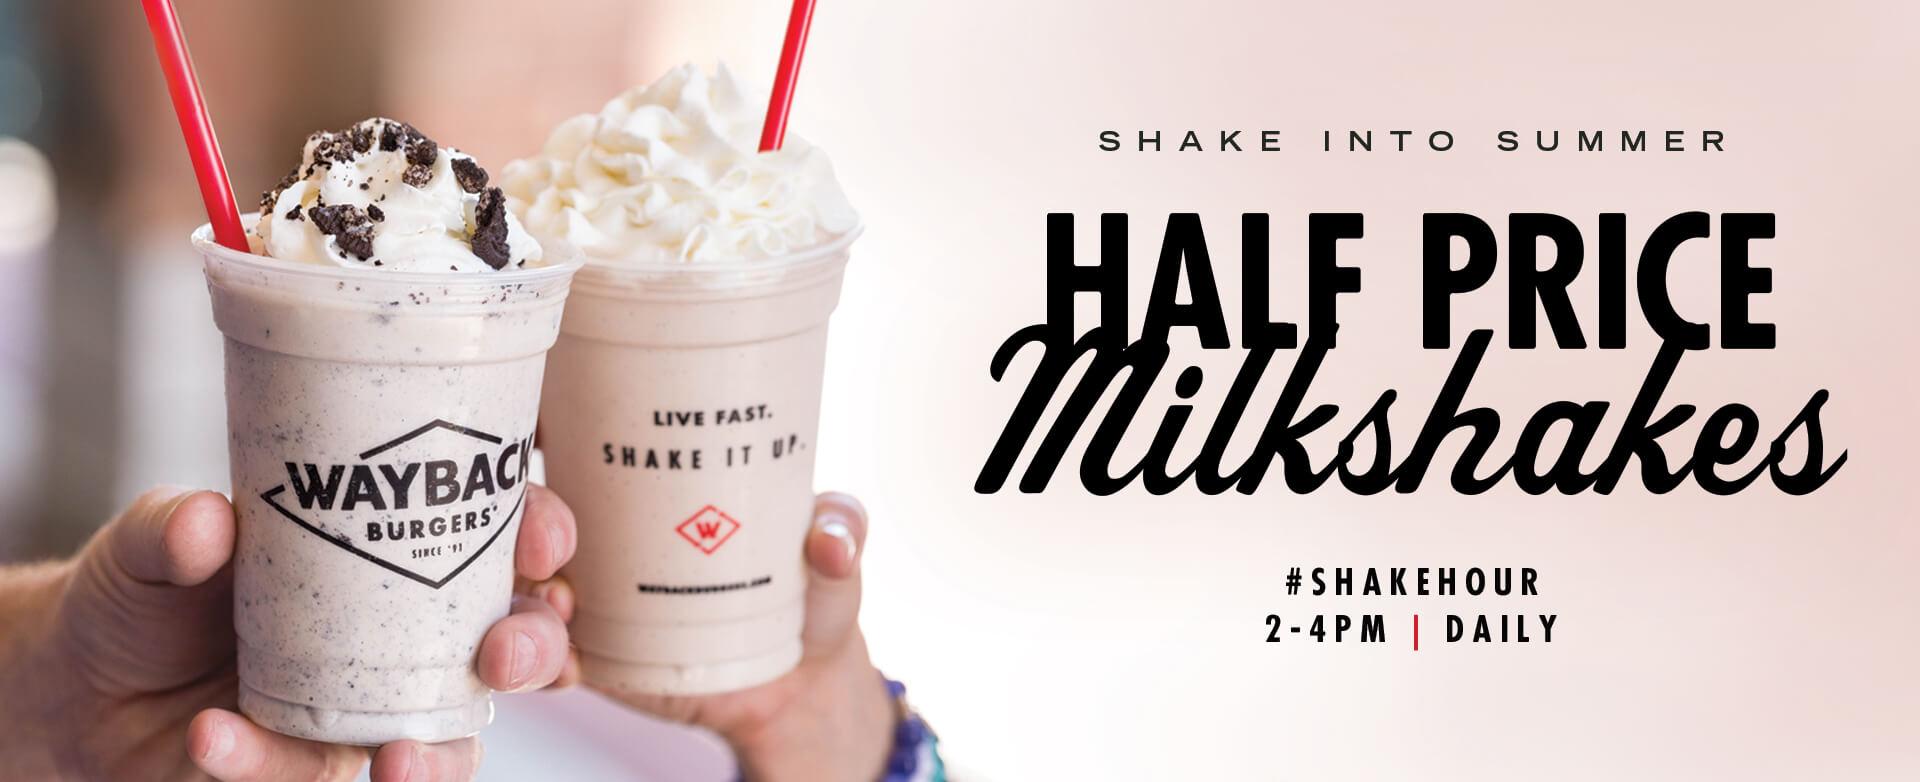 Shake Hour - Daily 2pm - 4pm